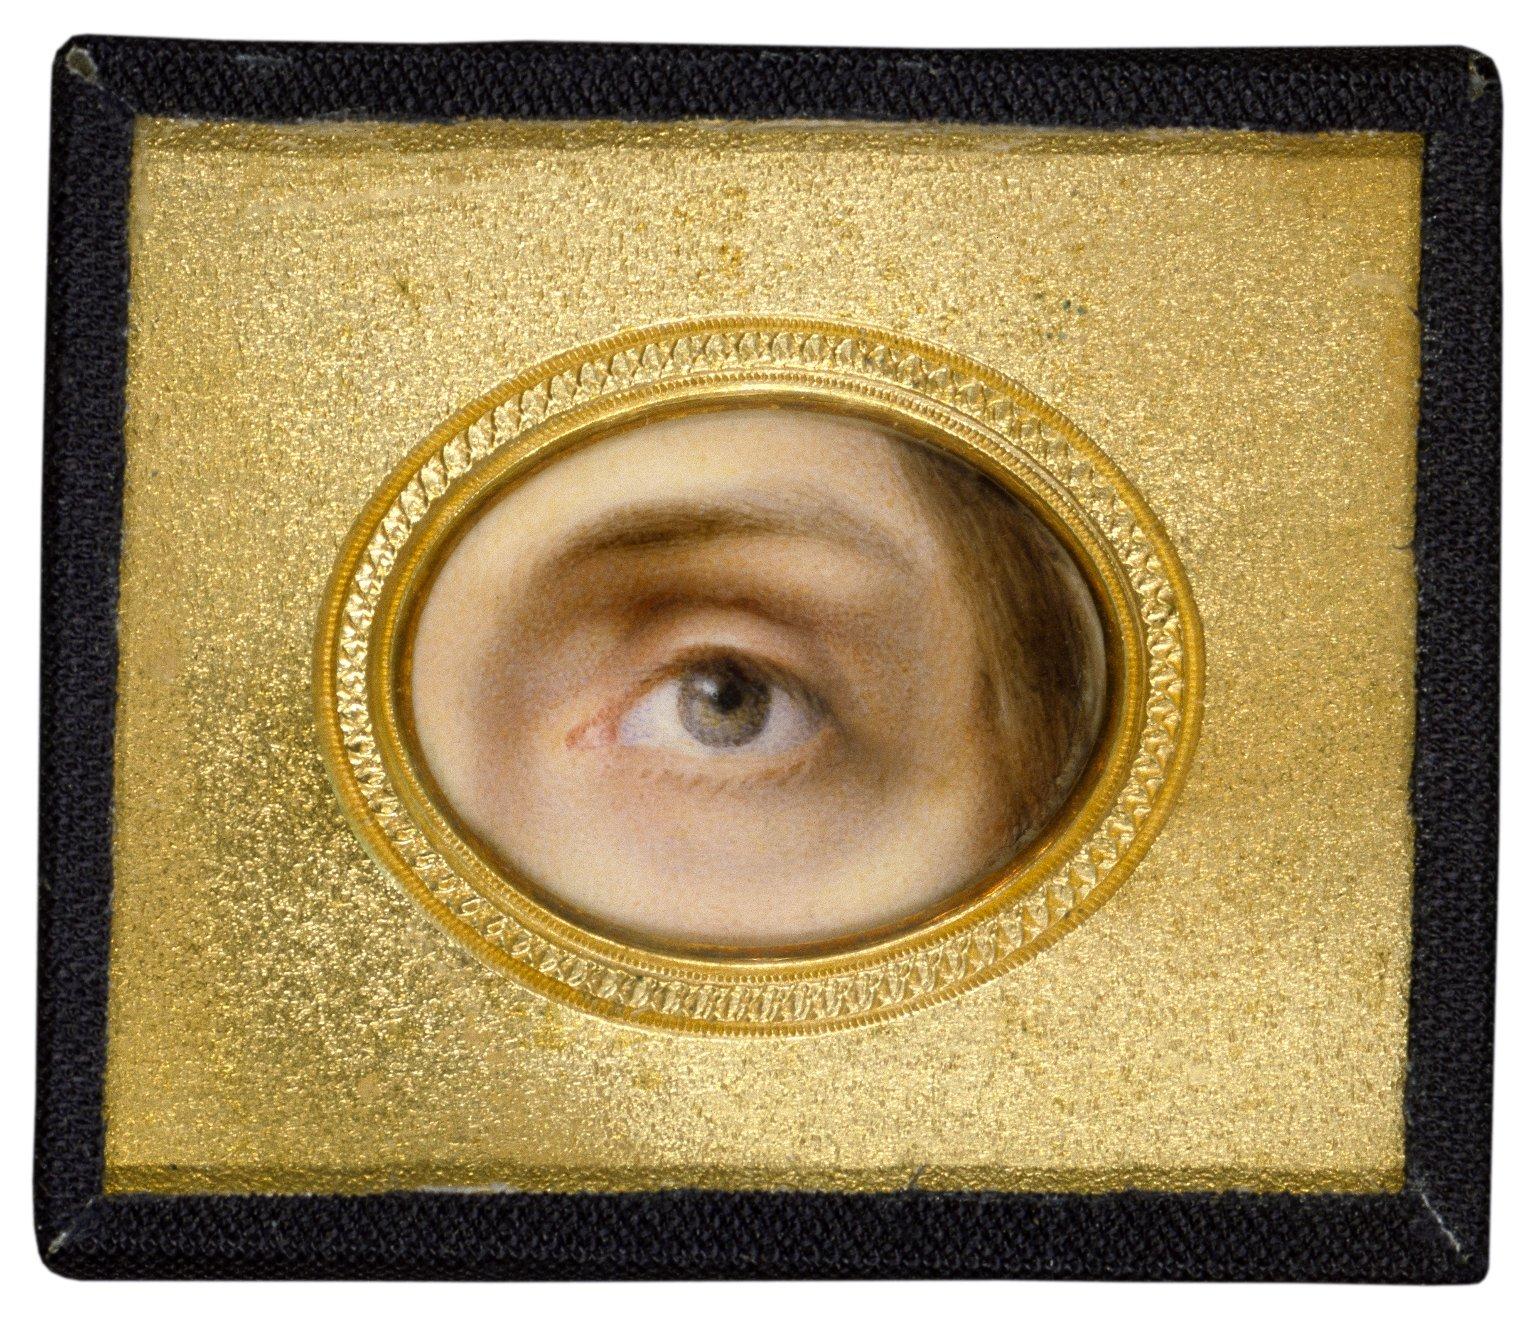 Charlotte Cushman's eye